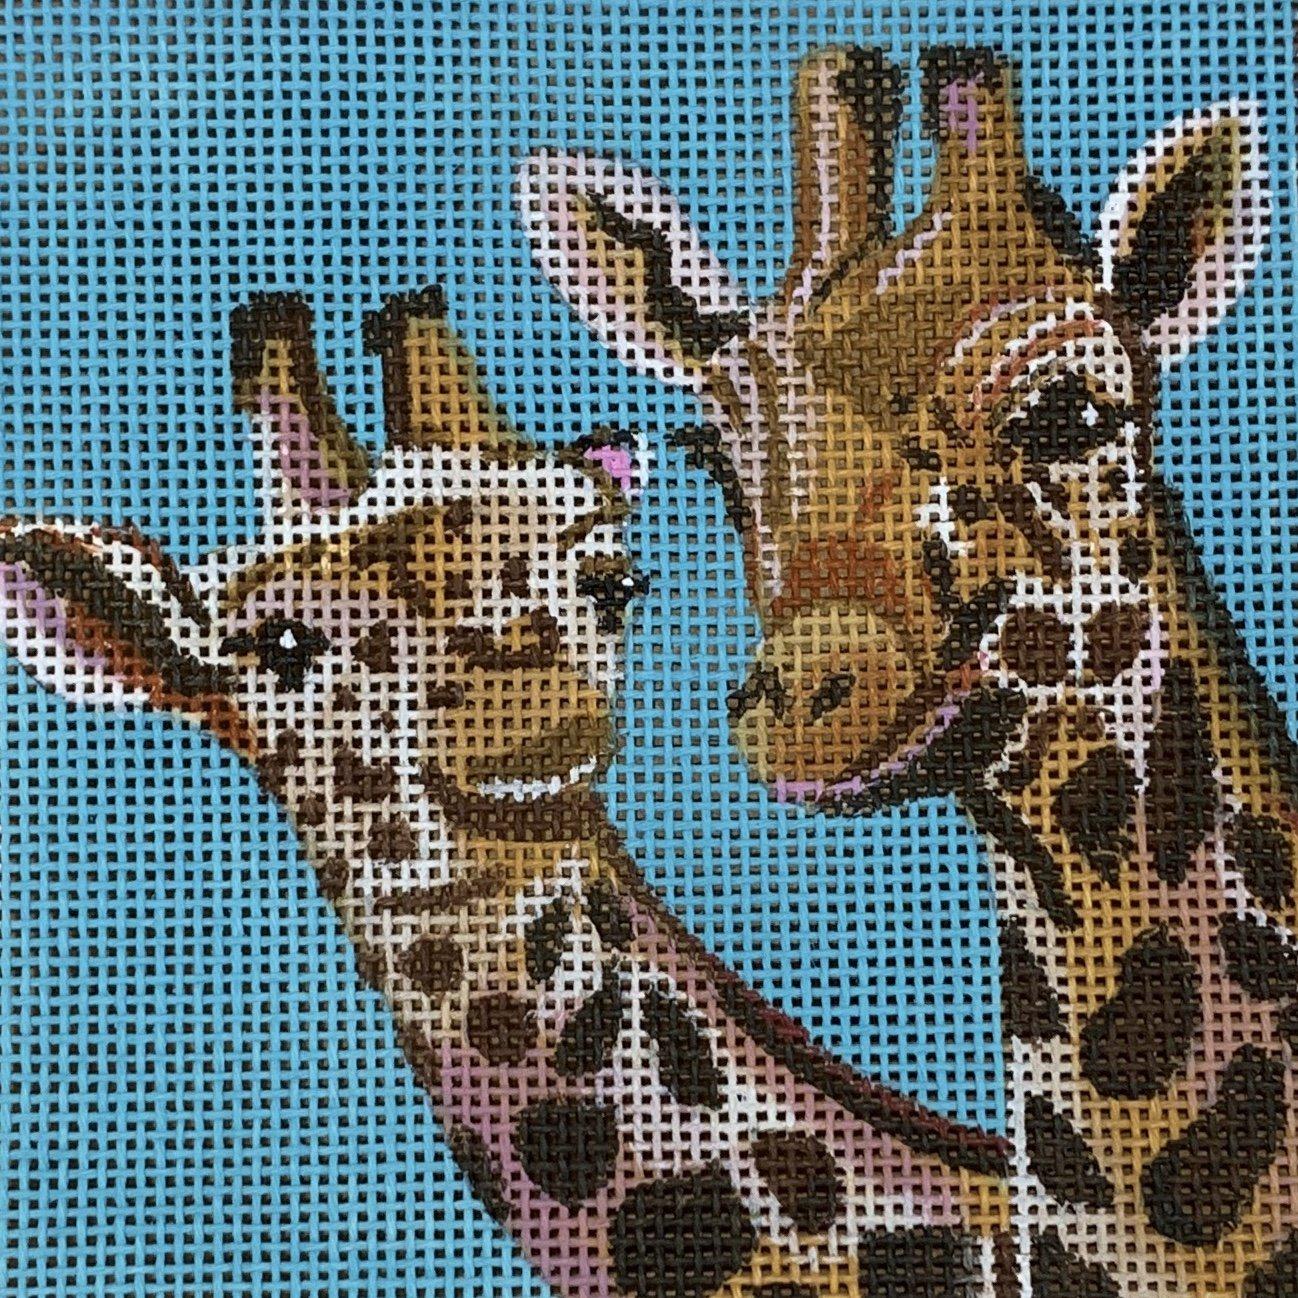 Two Giraffes Insert